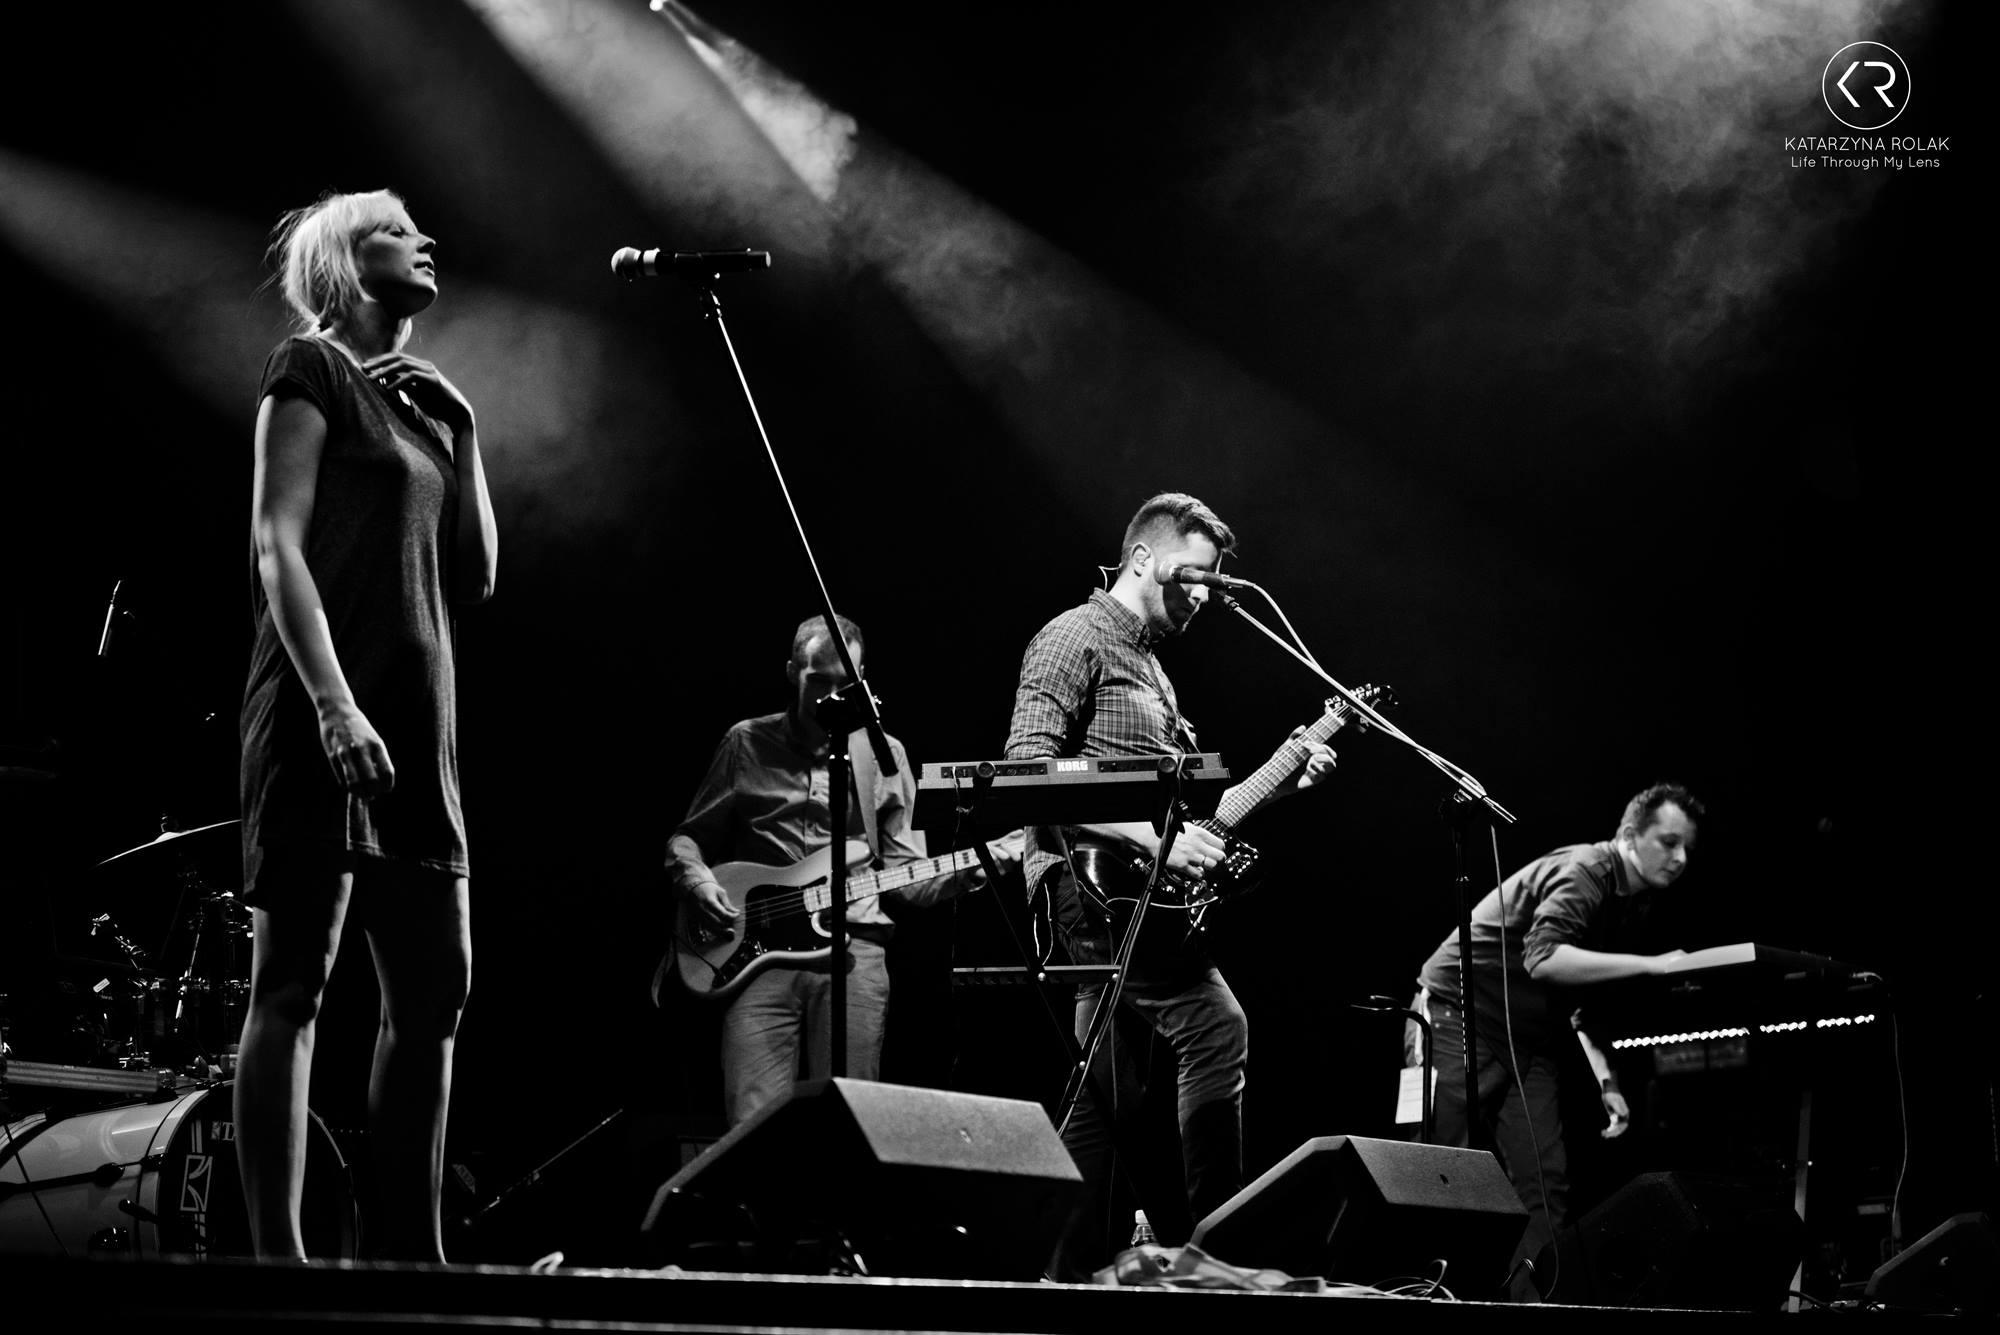 Live at Palladium Warsaw 2014 (photo: Katarzyna Rolak)